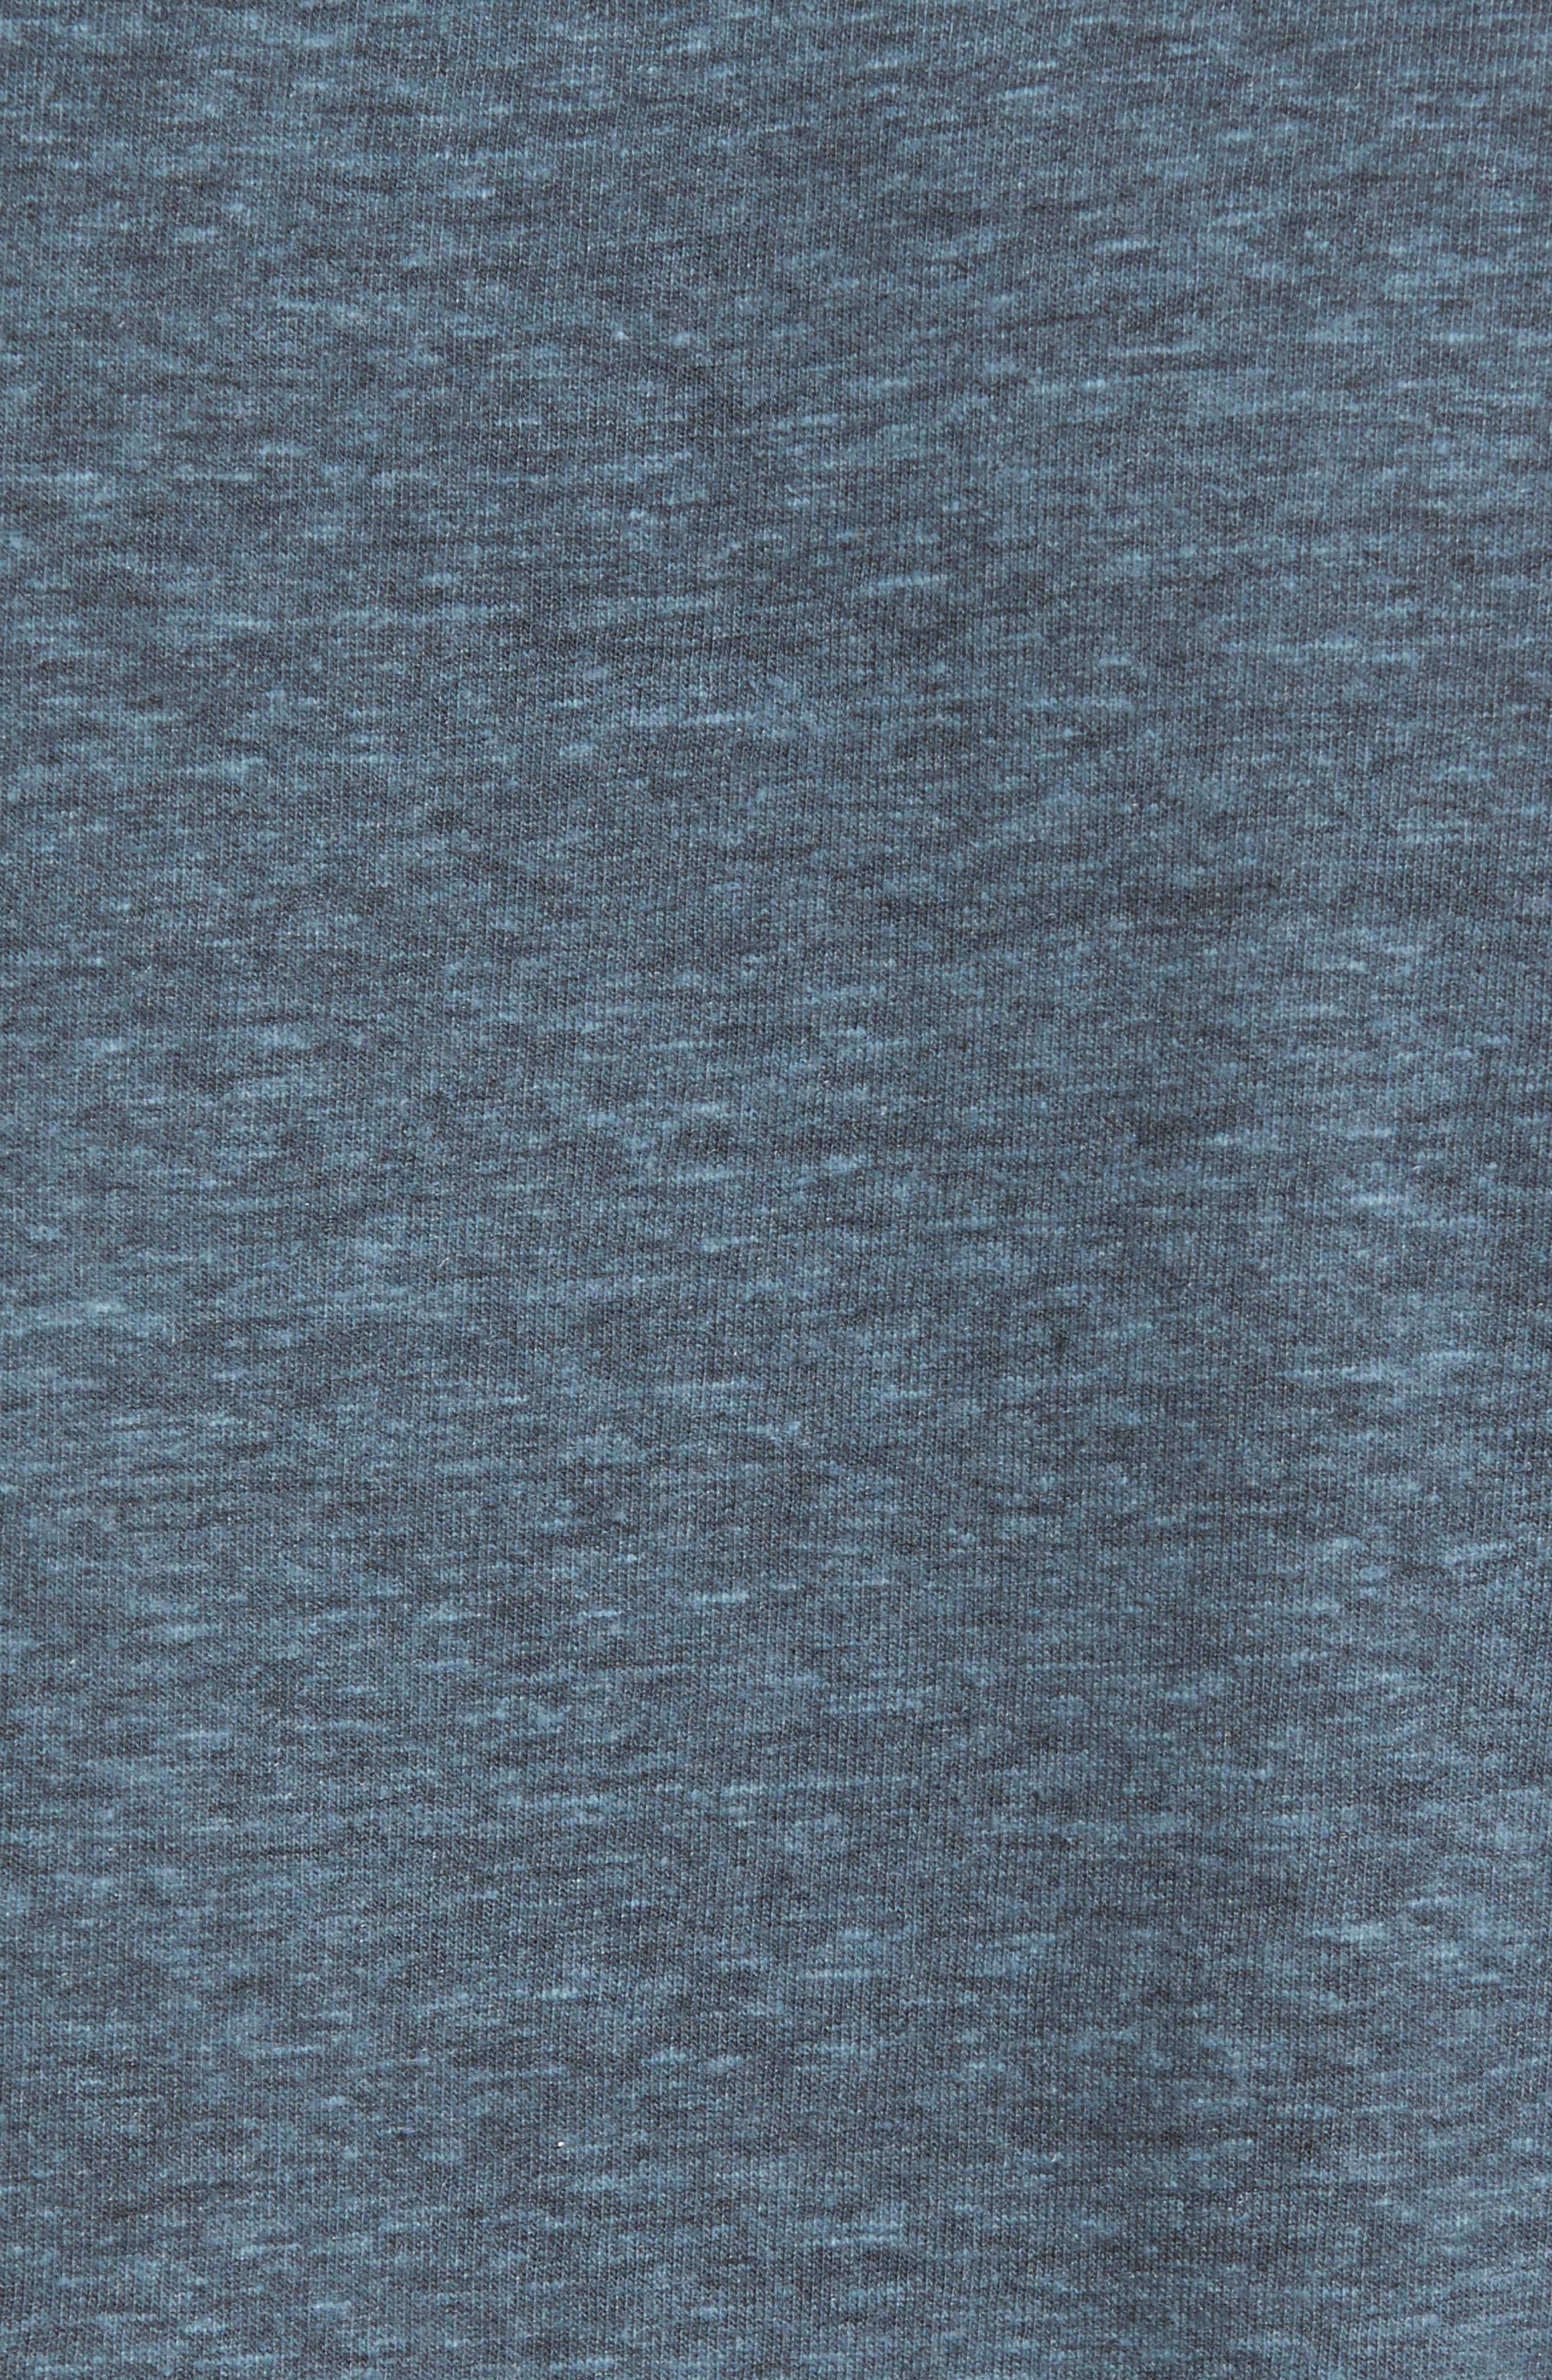 V-Neck Heathered T-Shirt,                             Alternate thumbnail 6, color,                             Real Teal